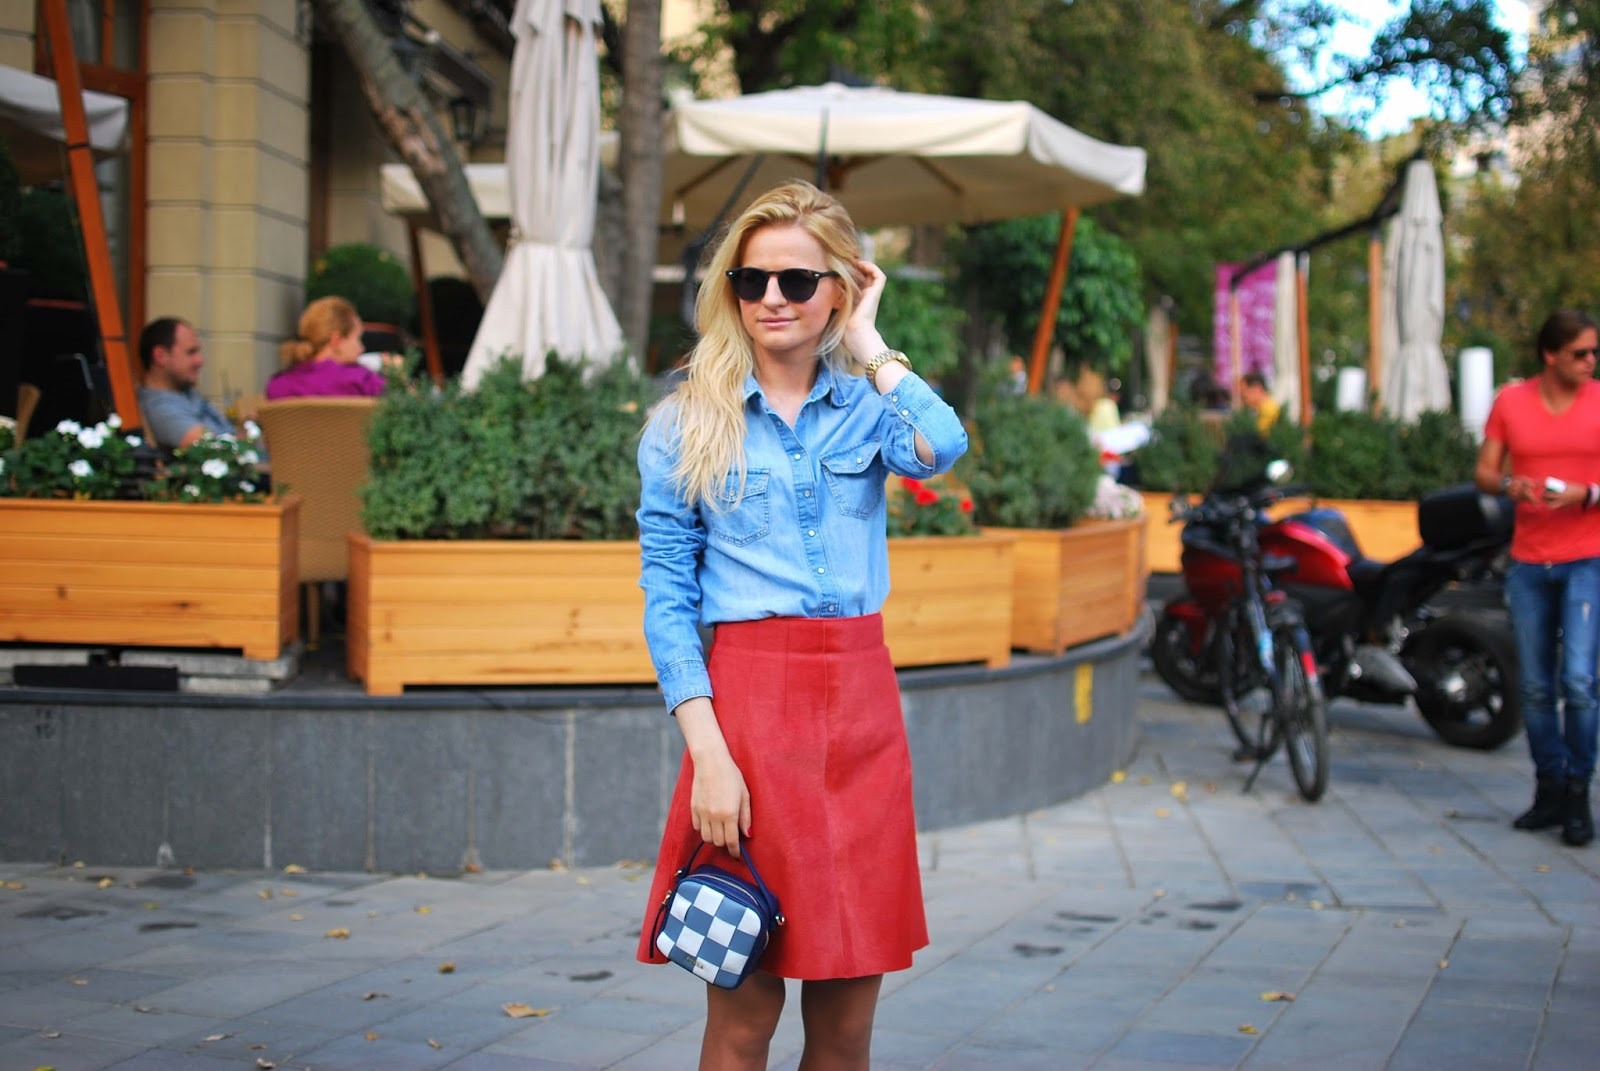 модный блоггер, российский модный блоггер, осенний тенденции, осень мода 2015